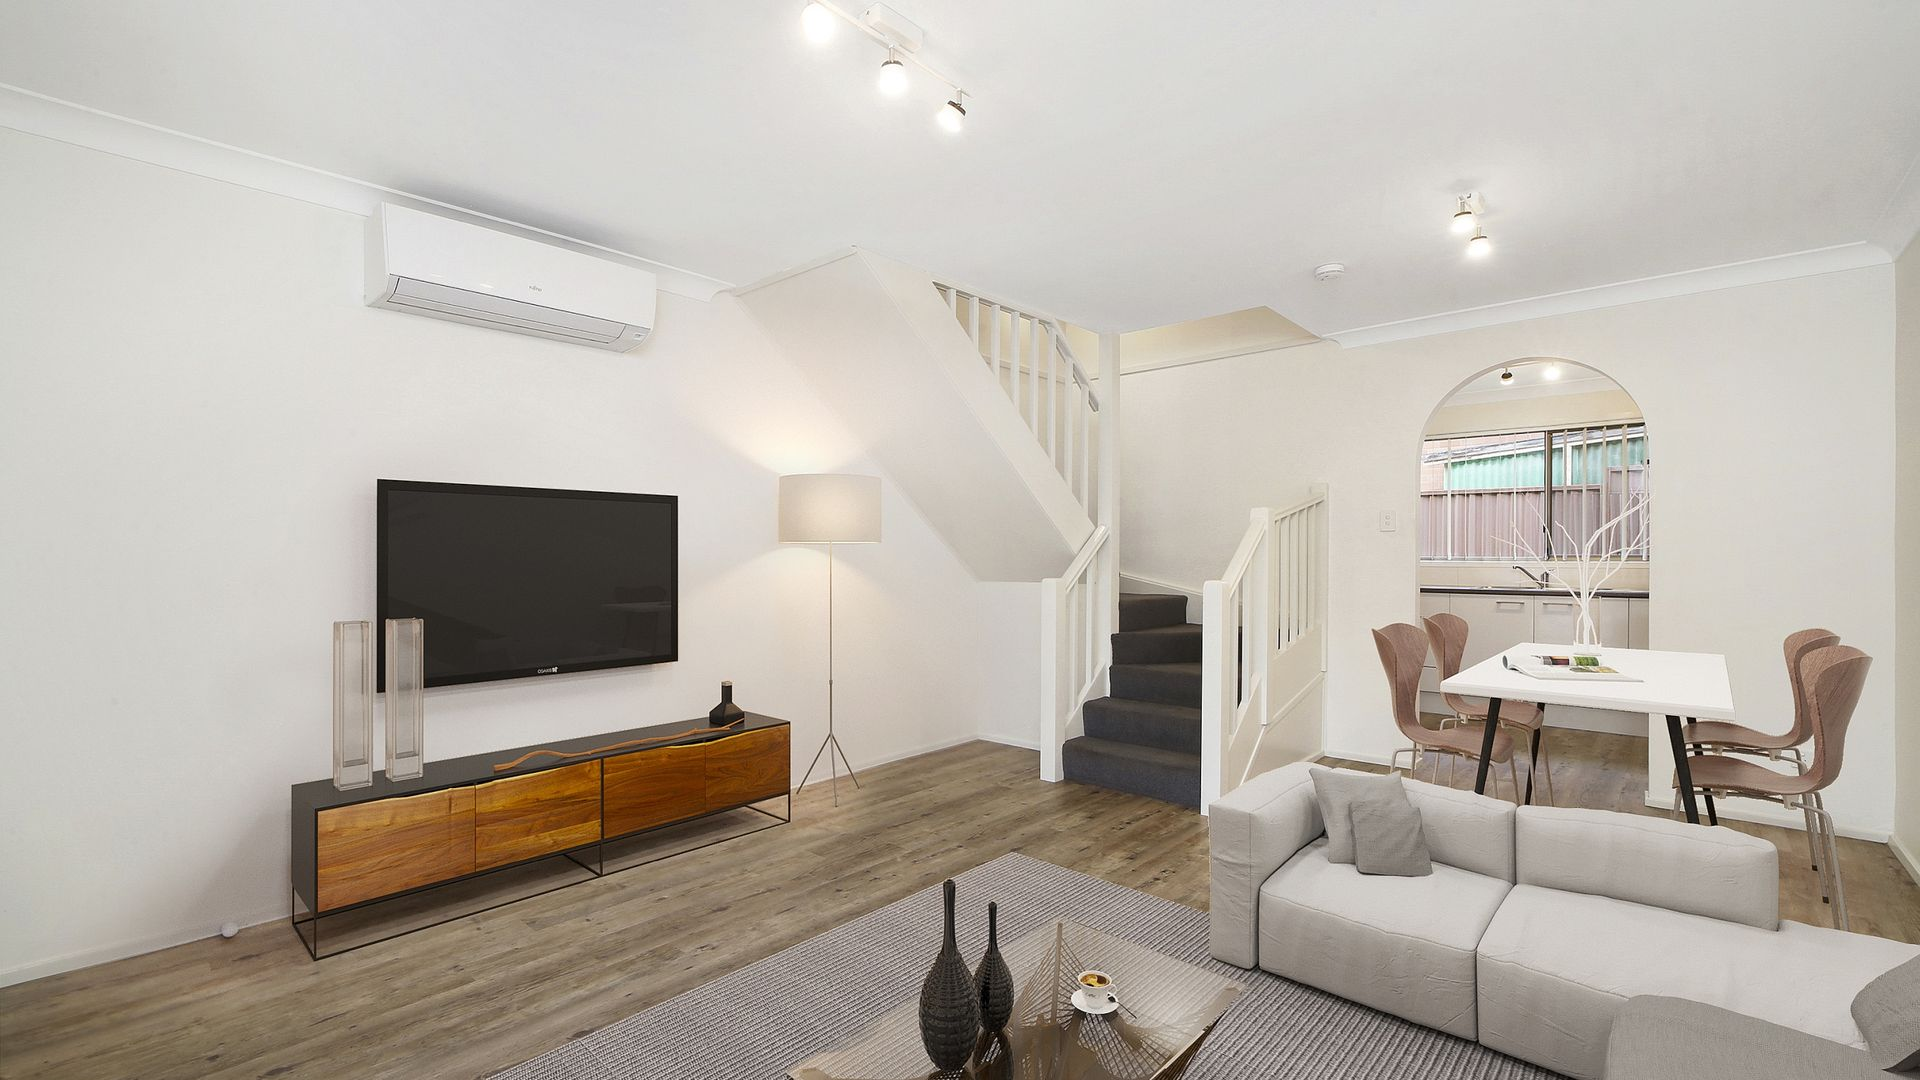 2/13 Beane Street West, Gosford NSW 2250, Image 1